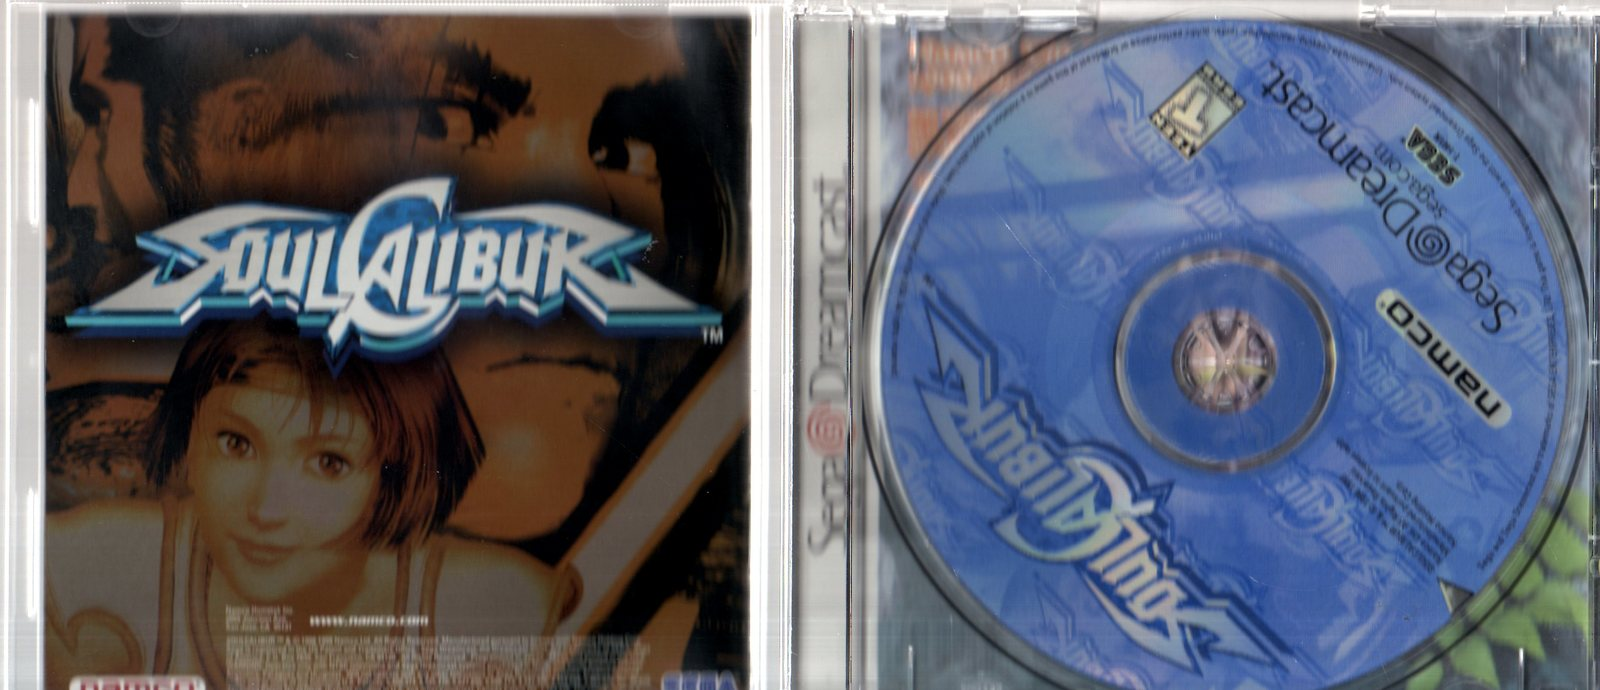 Sega Dreamcast - Soul Calibui image 4